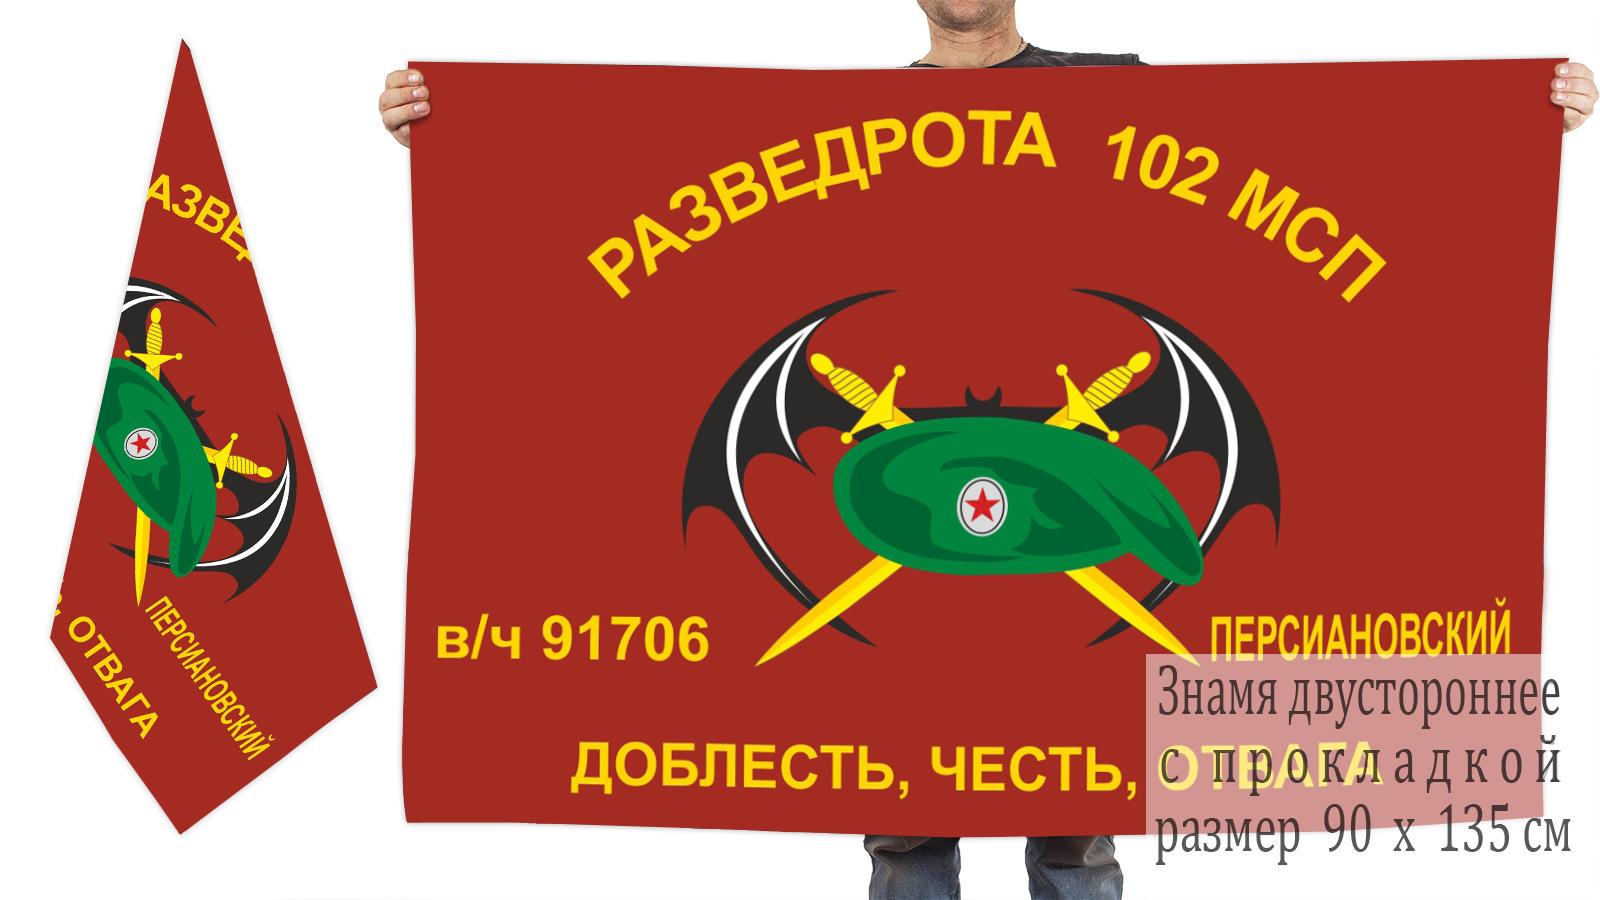 Двусторонний флаг Разведроты 102 МСП